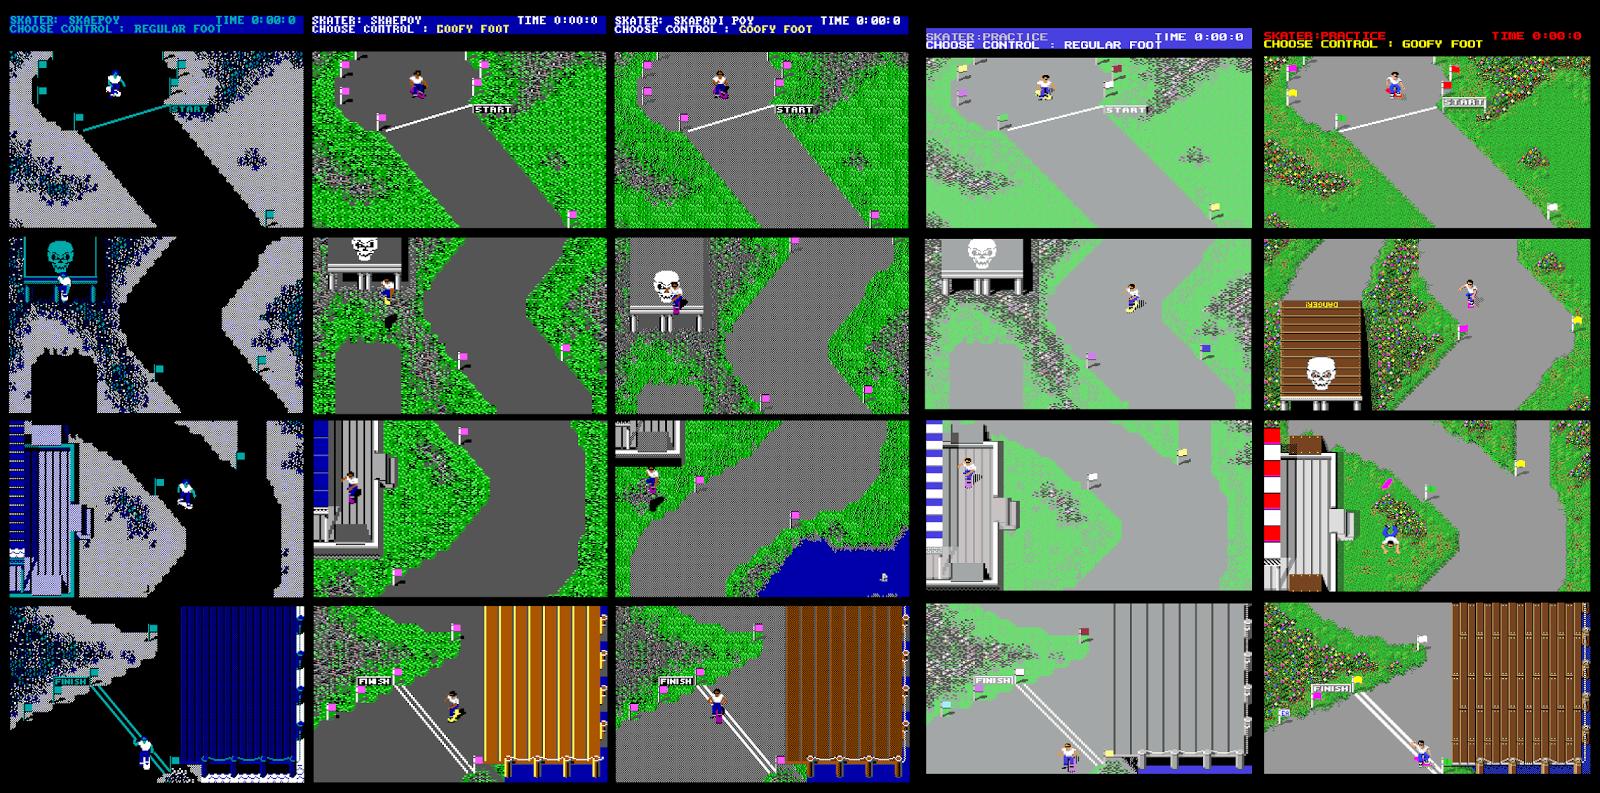 FRGCB - Finnish Retro Game Comparison Blog: Skate or Die